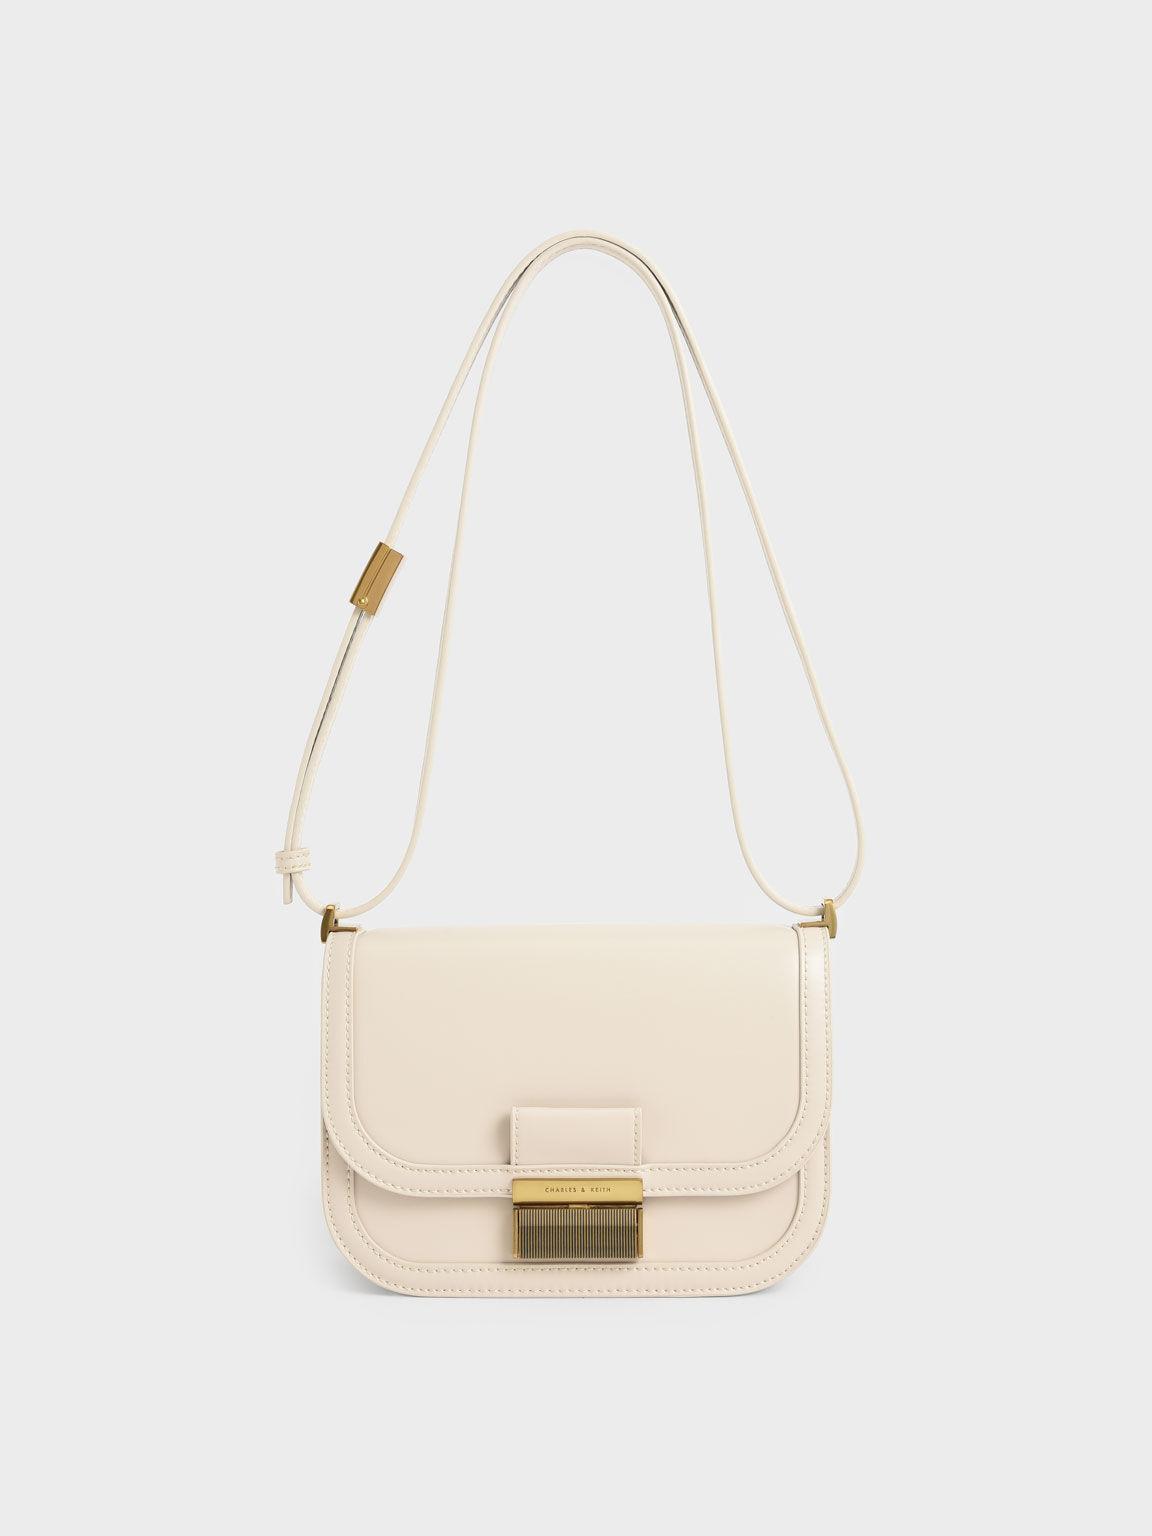 Charlot Crossbody Bag, Ivory, hi-res